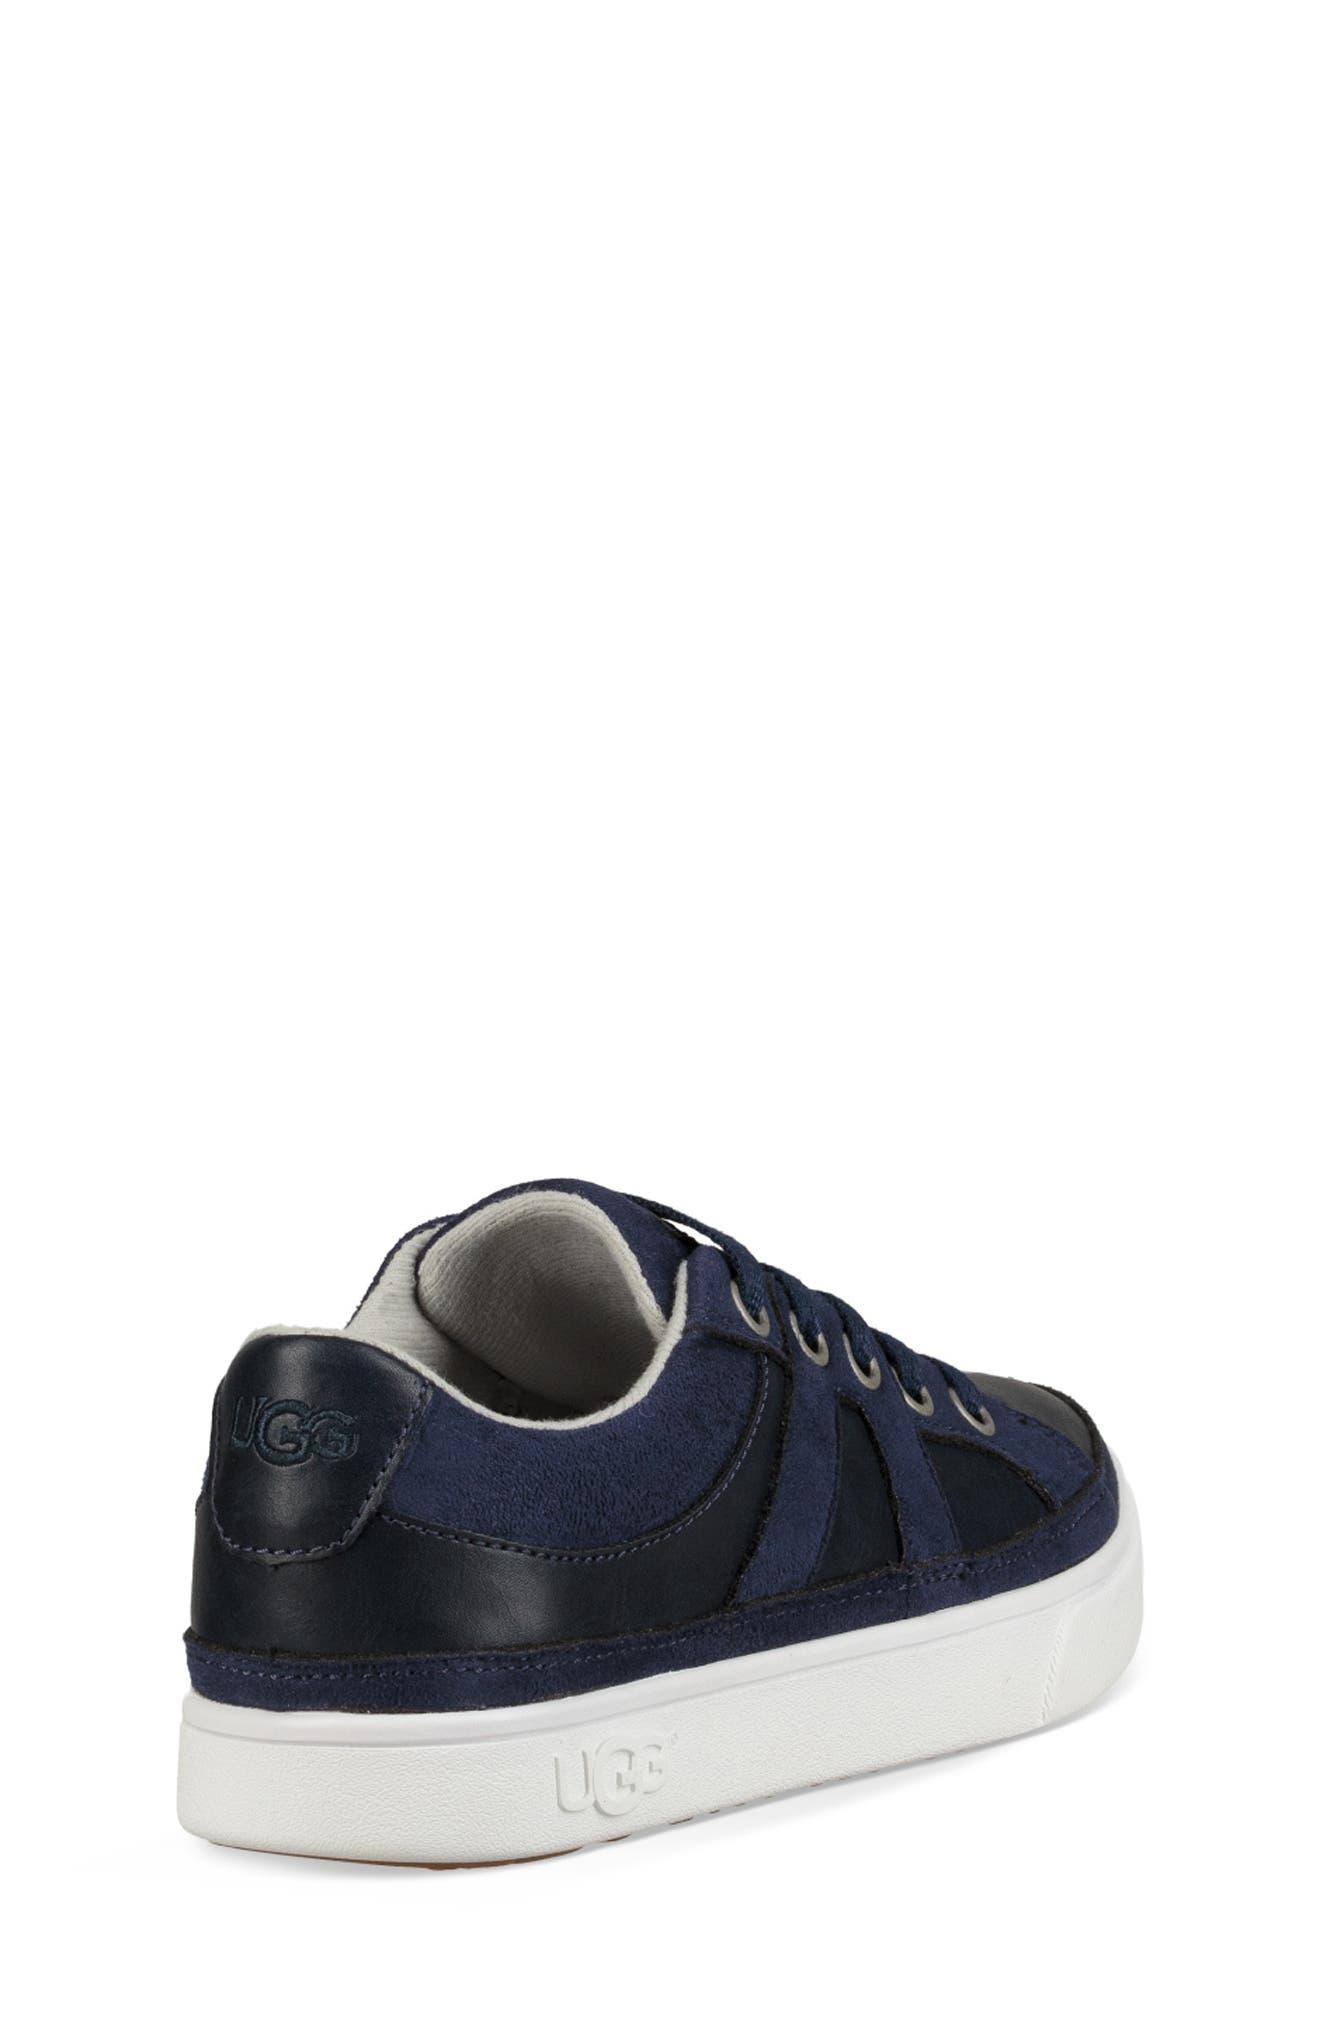 Marcus Sneaker,                             Alternate thumbnail 2, color,                             NAVY